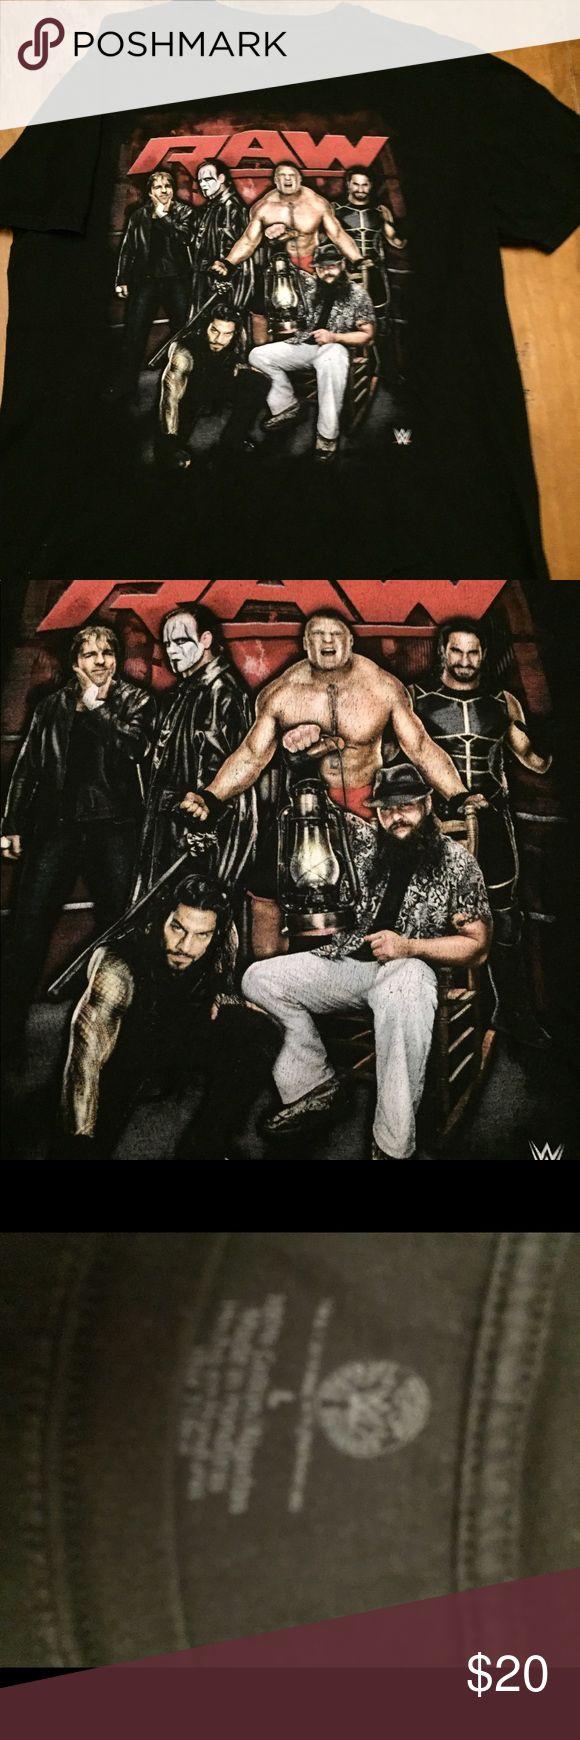 Retro WWE T shirt RAW is War Good condition WWE Shirts & Tops Tees - Short Sleeve